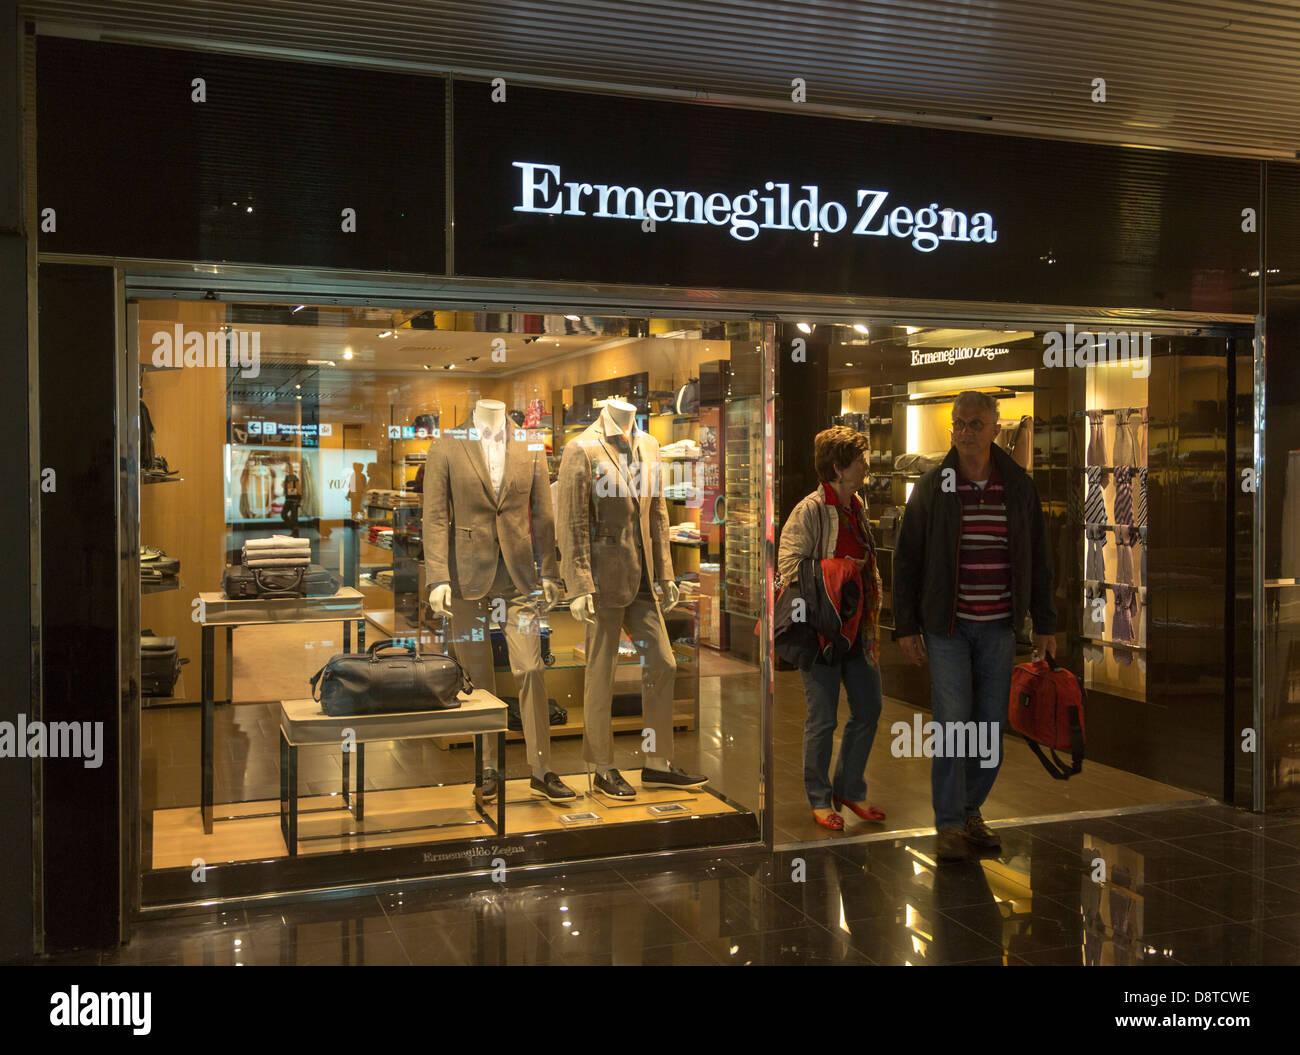 Ermenegildo Stockfotos & Ermenegildo Bilder - Alamy